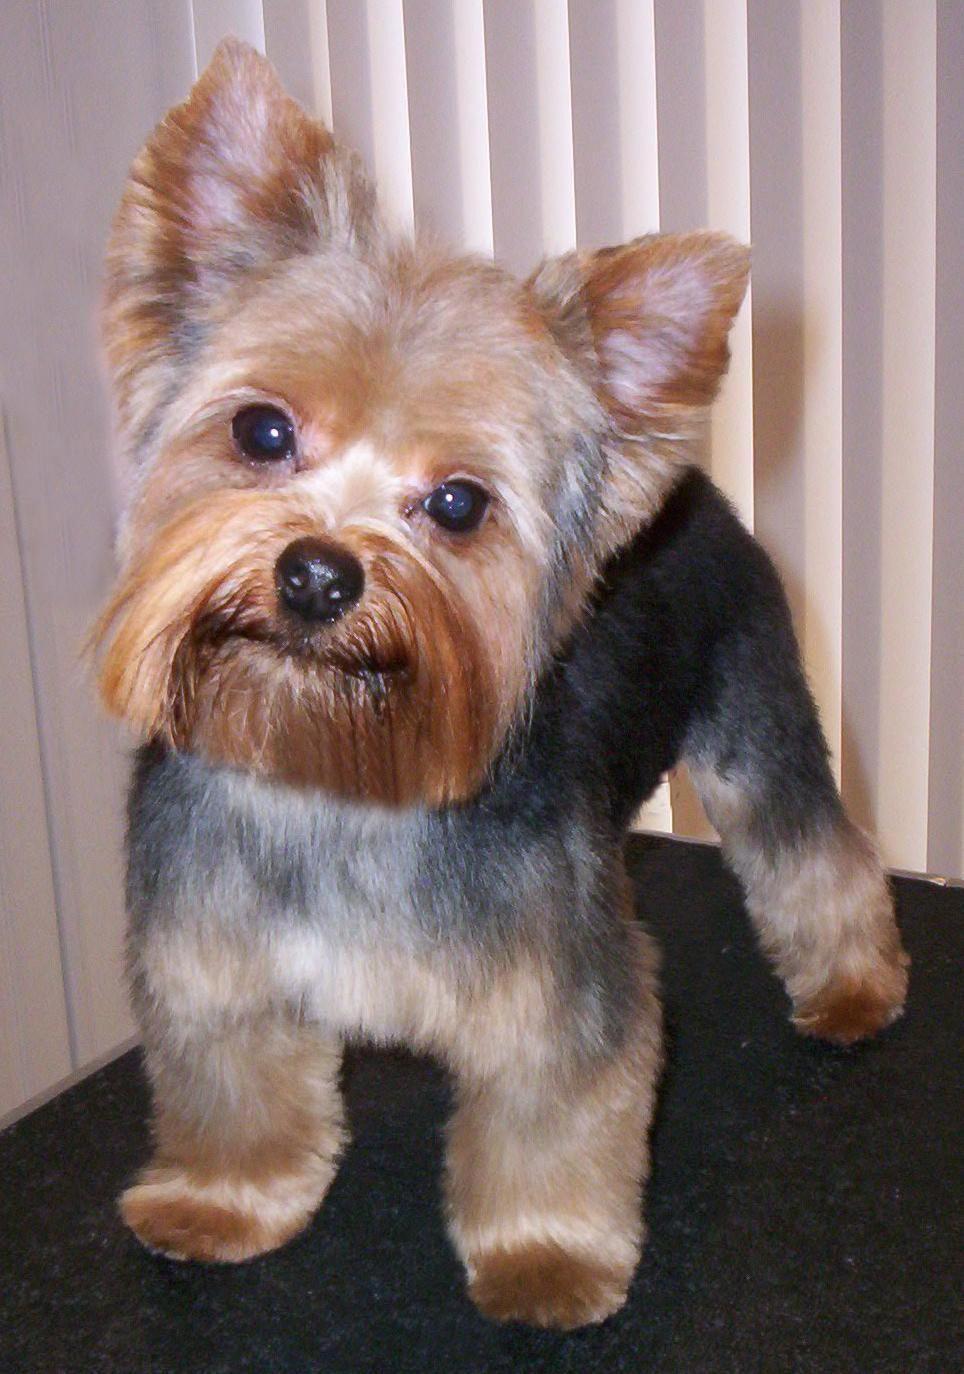 Image Result For Yorkie Teddy Bear Cut Yorkshireterrierhaircut